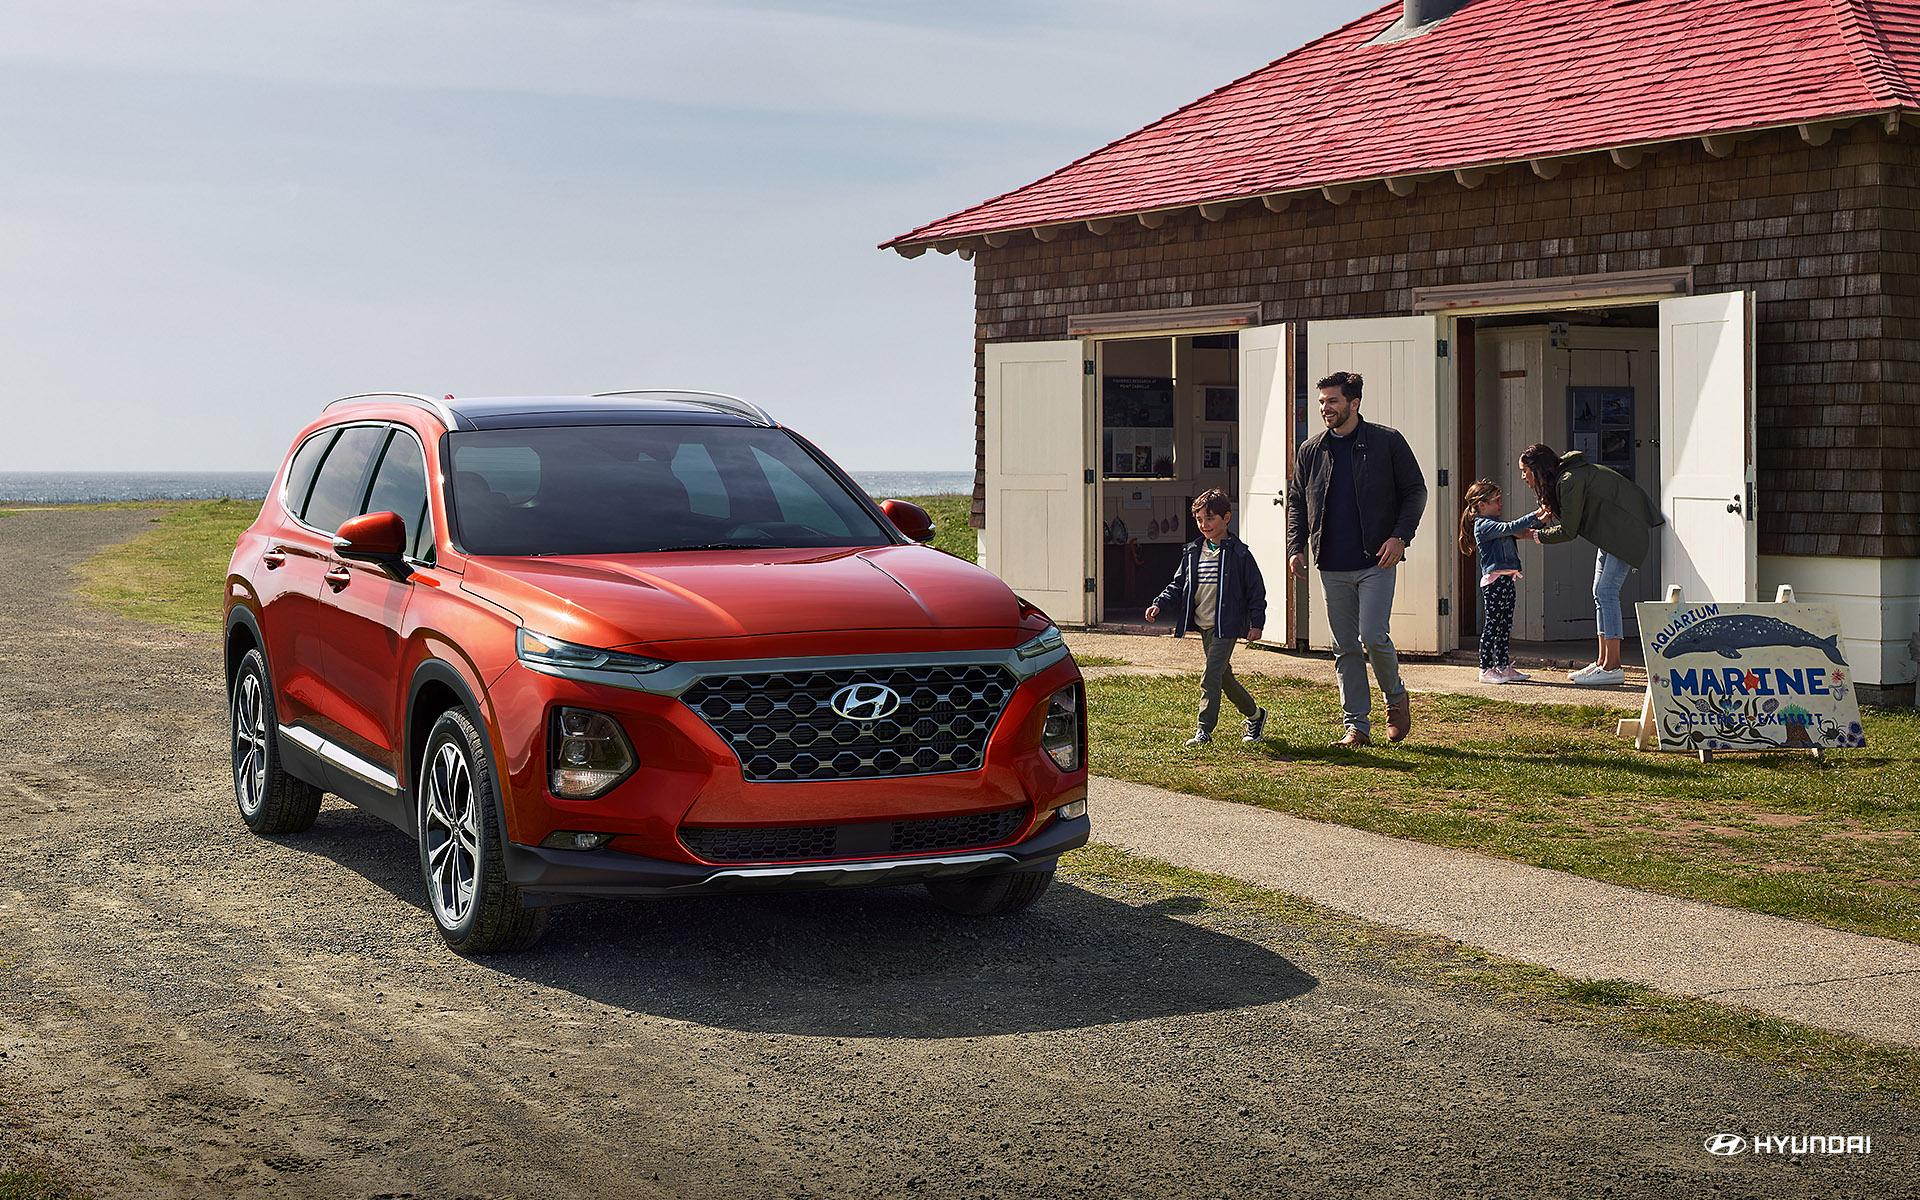 2020 Hyundai Santa Fe Leasing near Stafford, VA